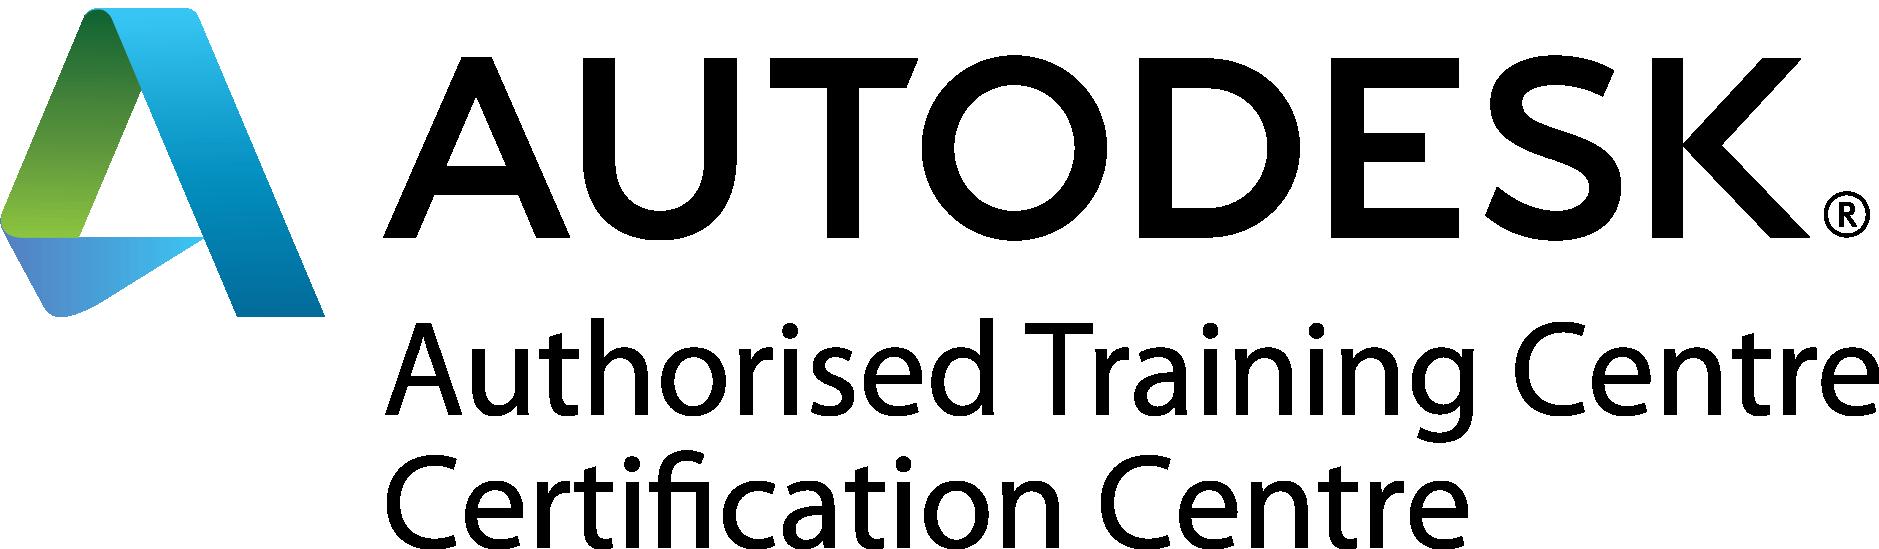 logo autodesk 2017